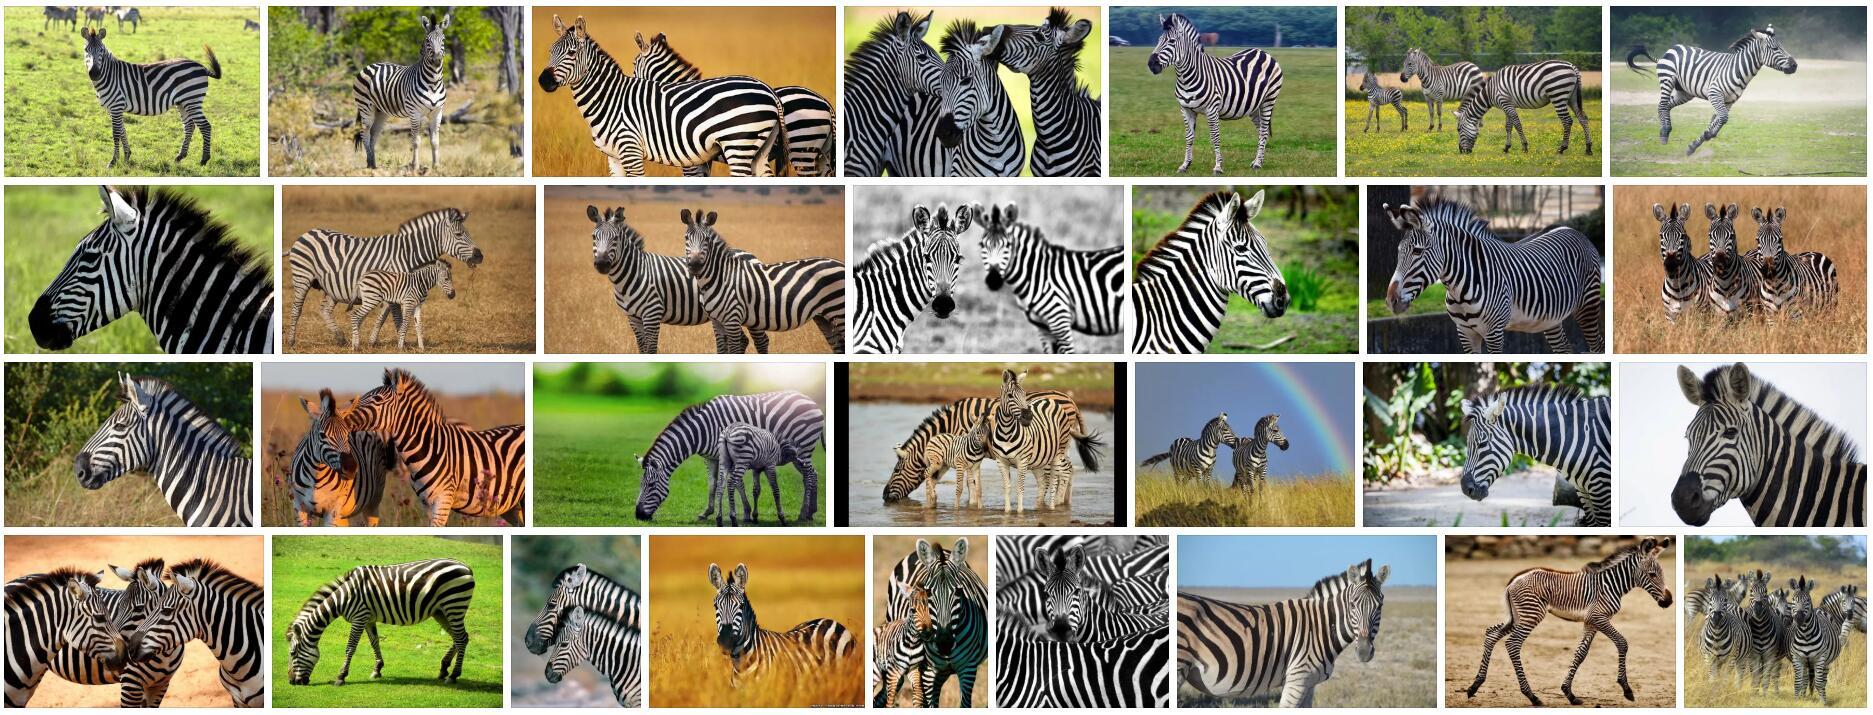 What is Zebra